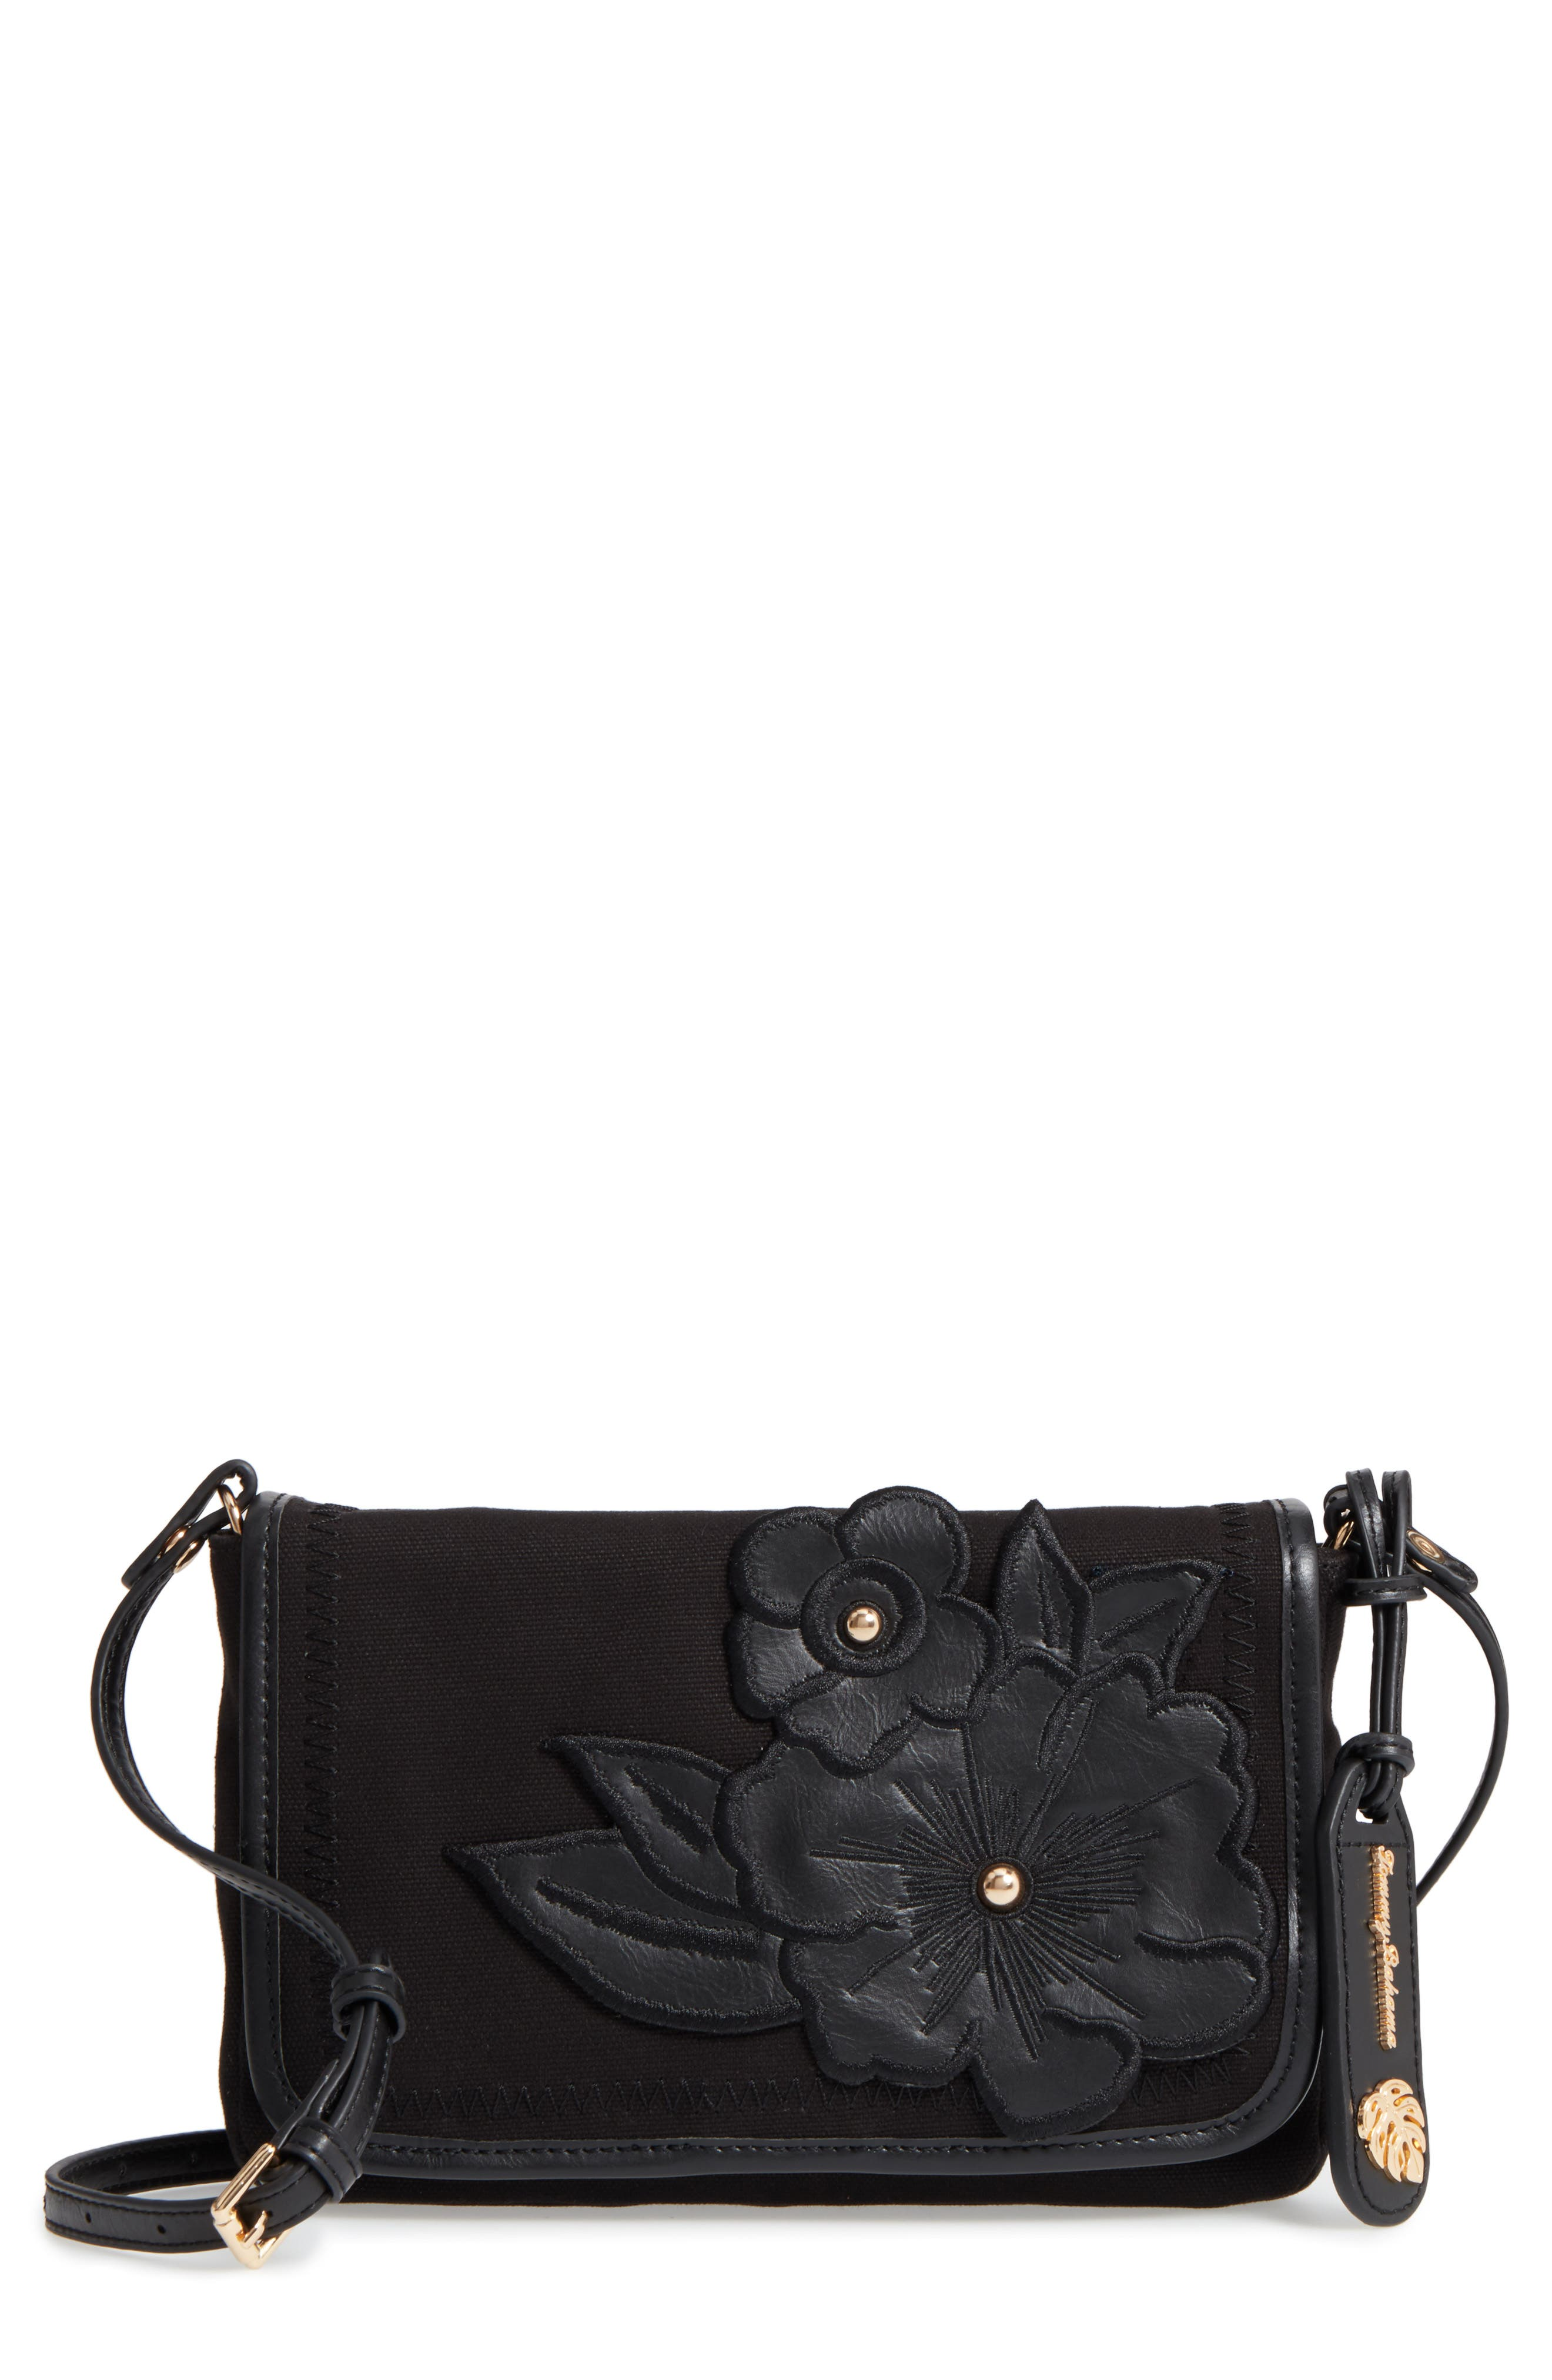 Casbah Convertible Canvas Crossbody Bag,                         Main,                         color, 001